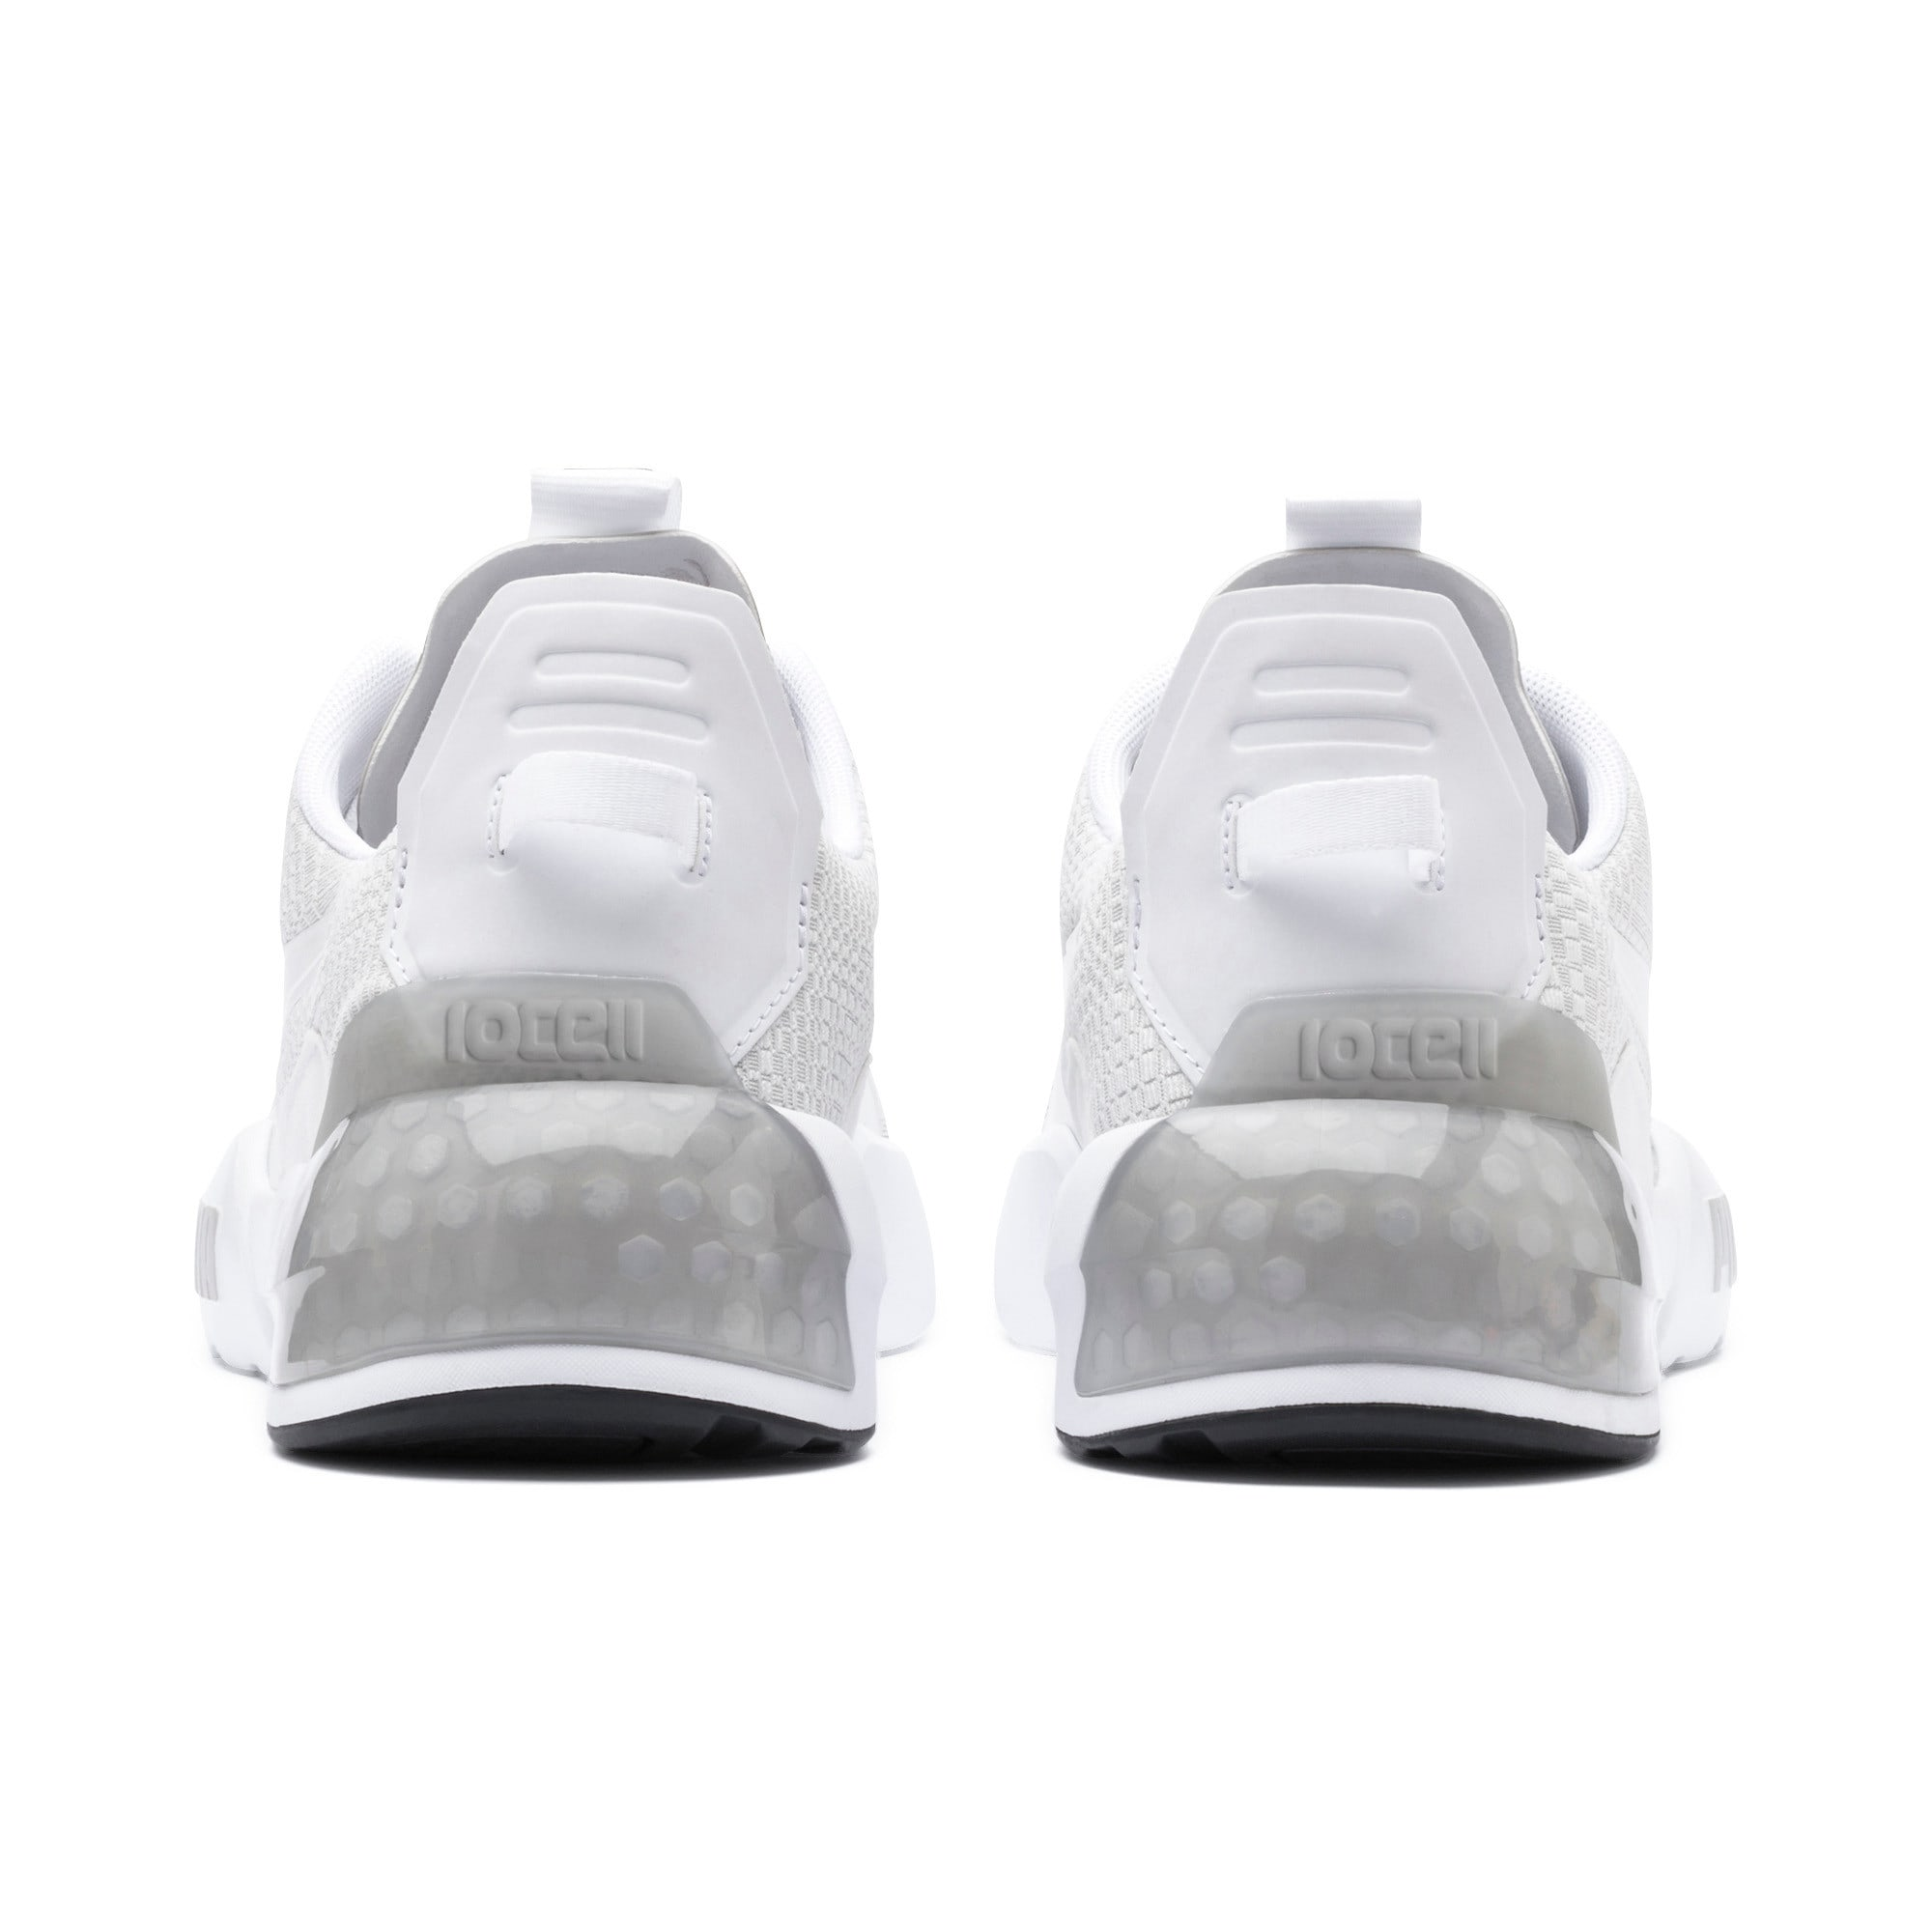 Thumbnail 4 of CELL Phase Lights Men's Running Shoes, Puma White-Gray Violet, medium